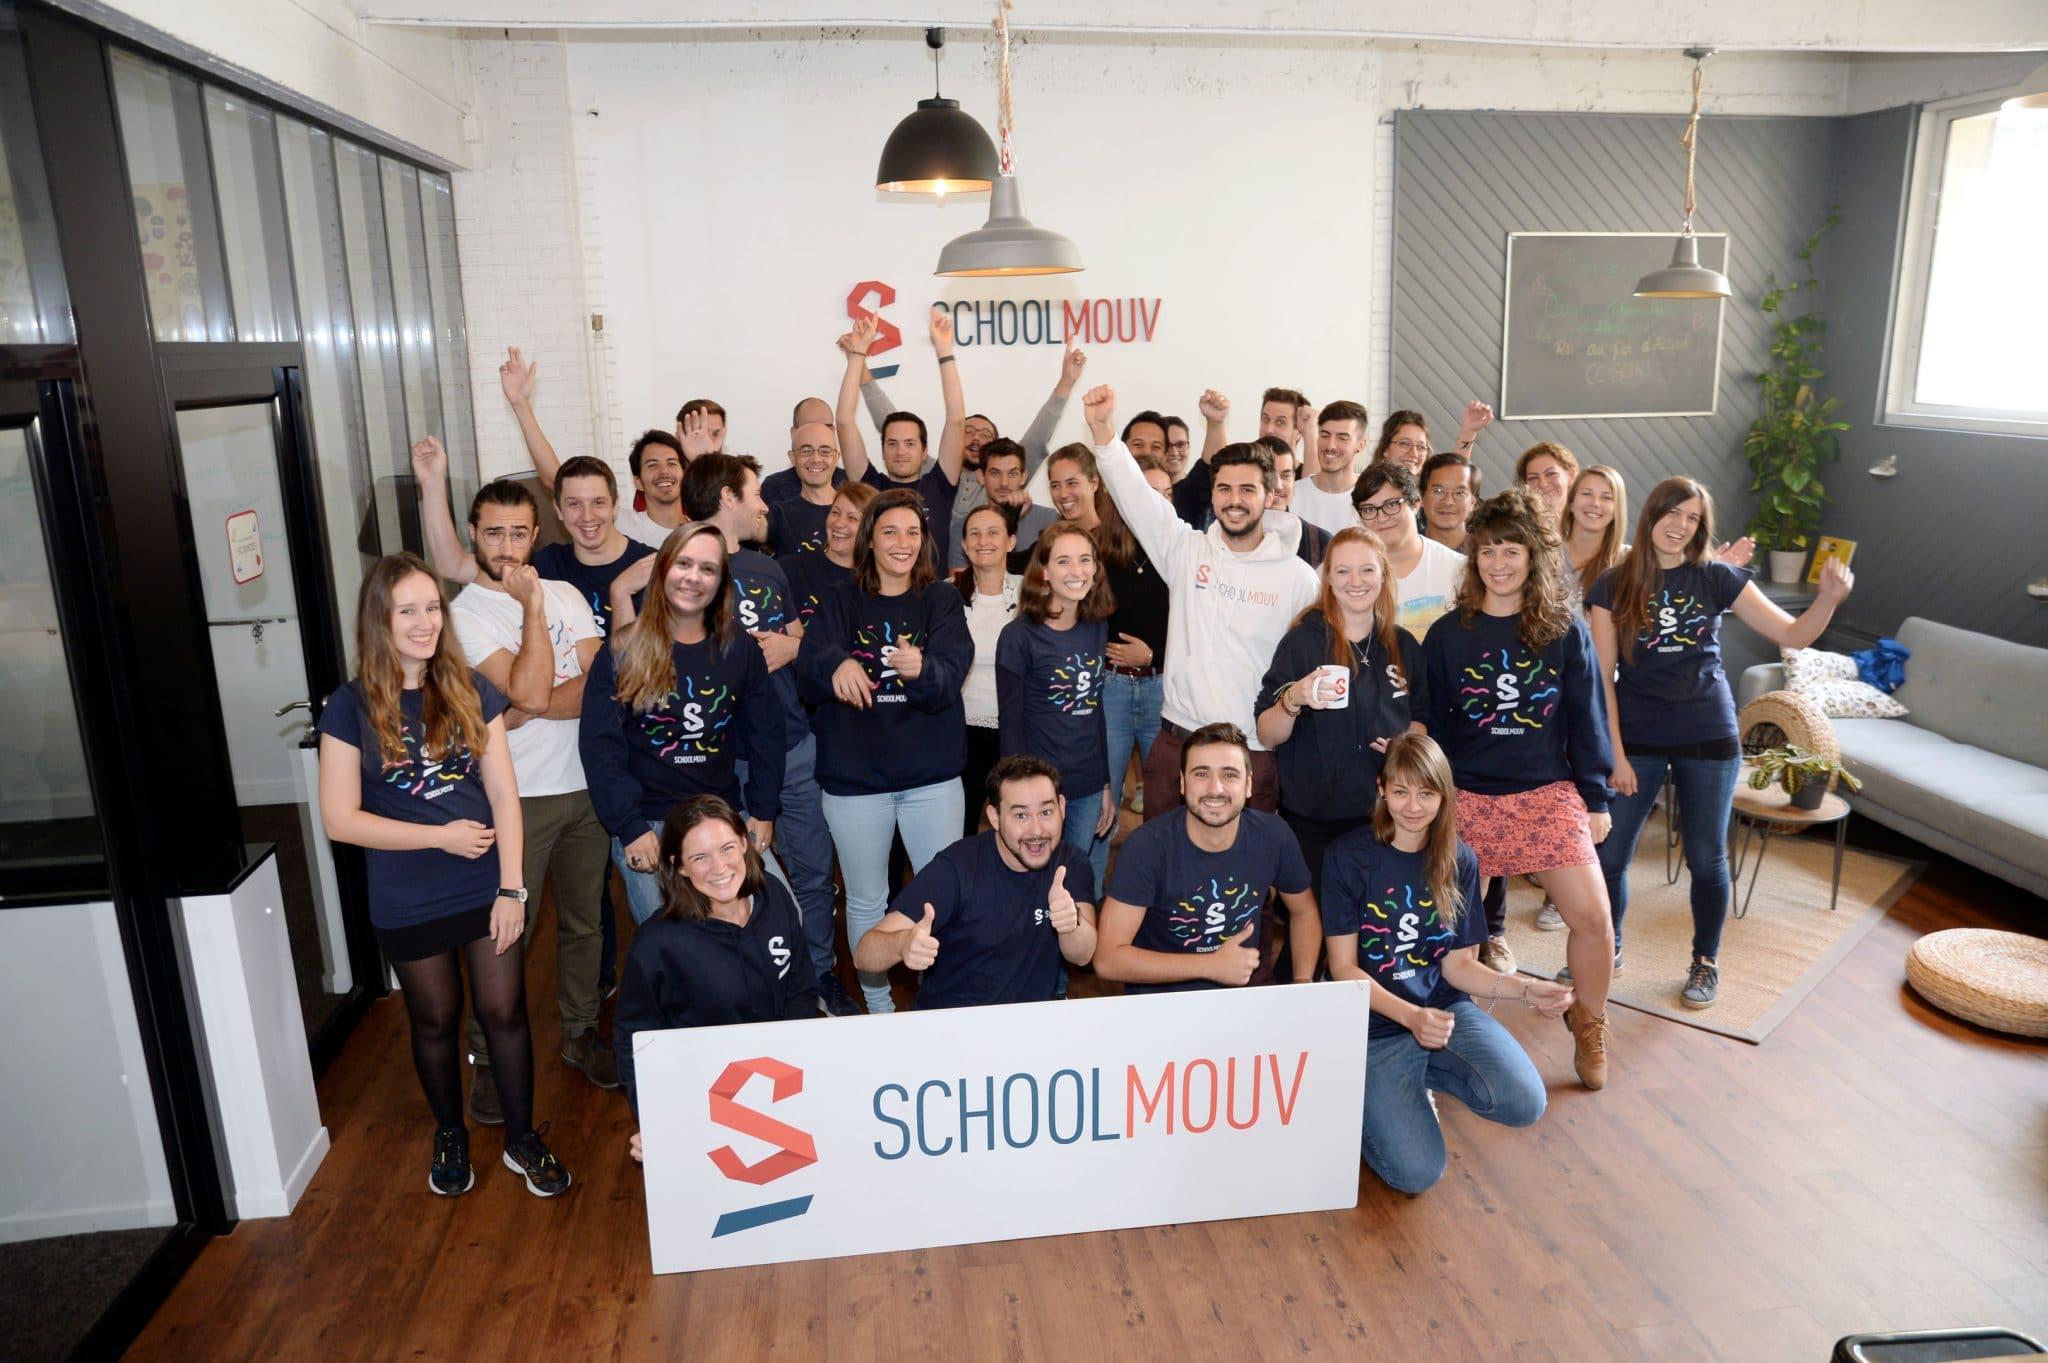 shannon picardo schoolmouv